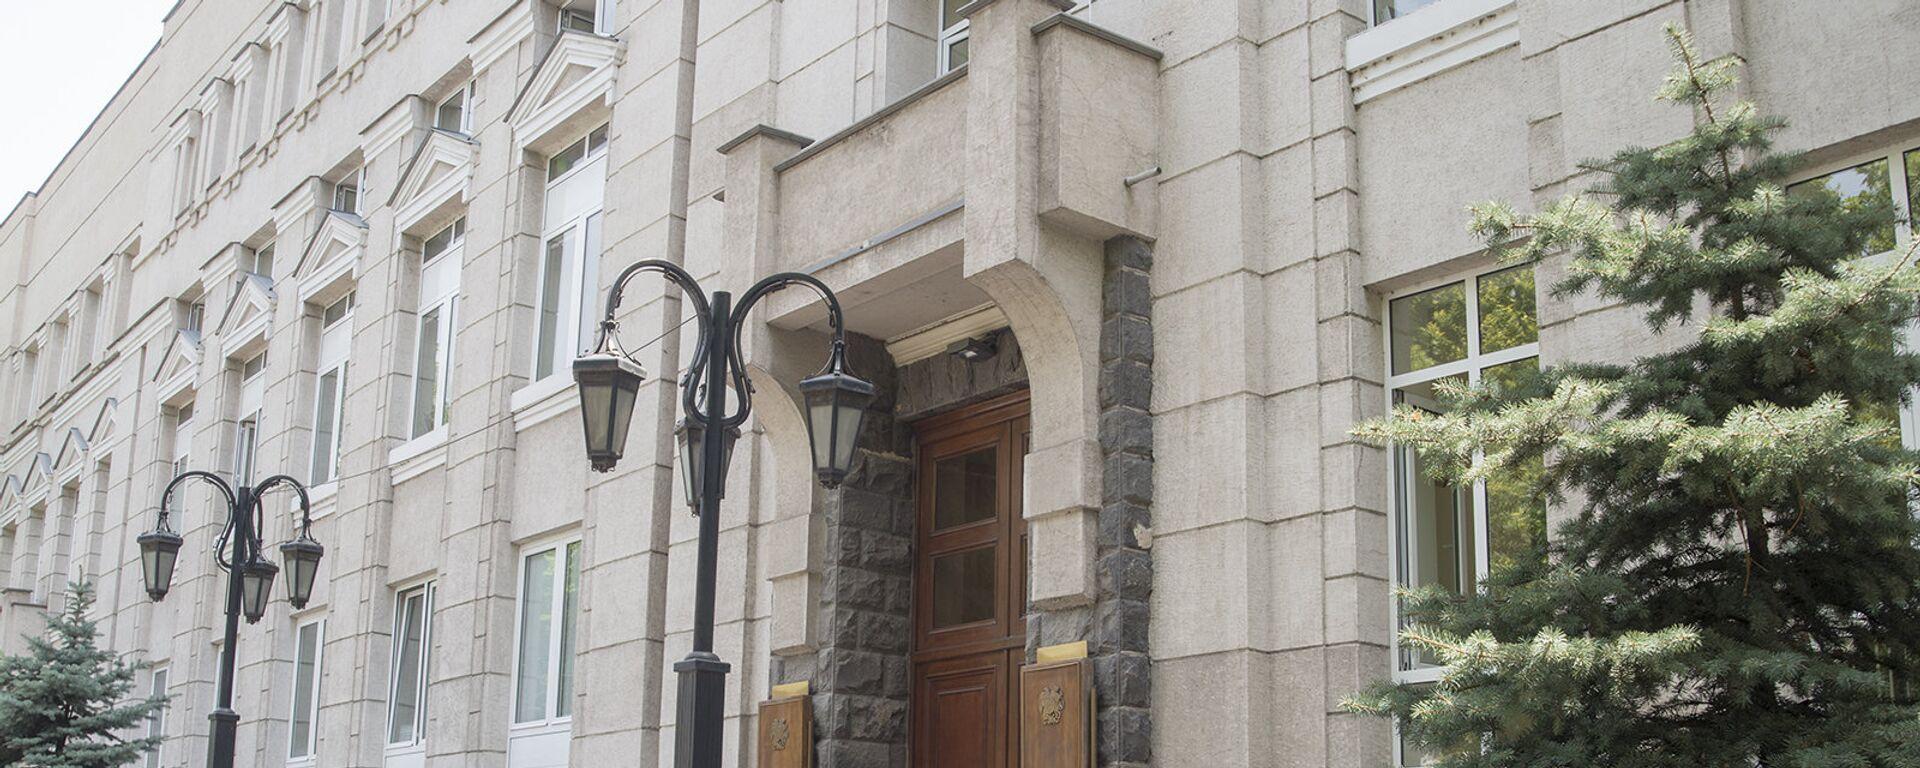 Здание ЦБ Армении - Sputnik Армения, 1920, 01.06.2021